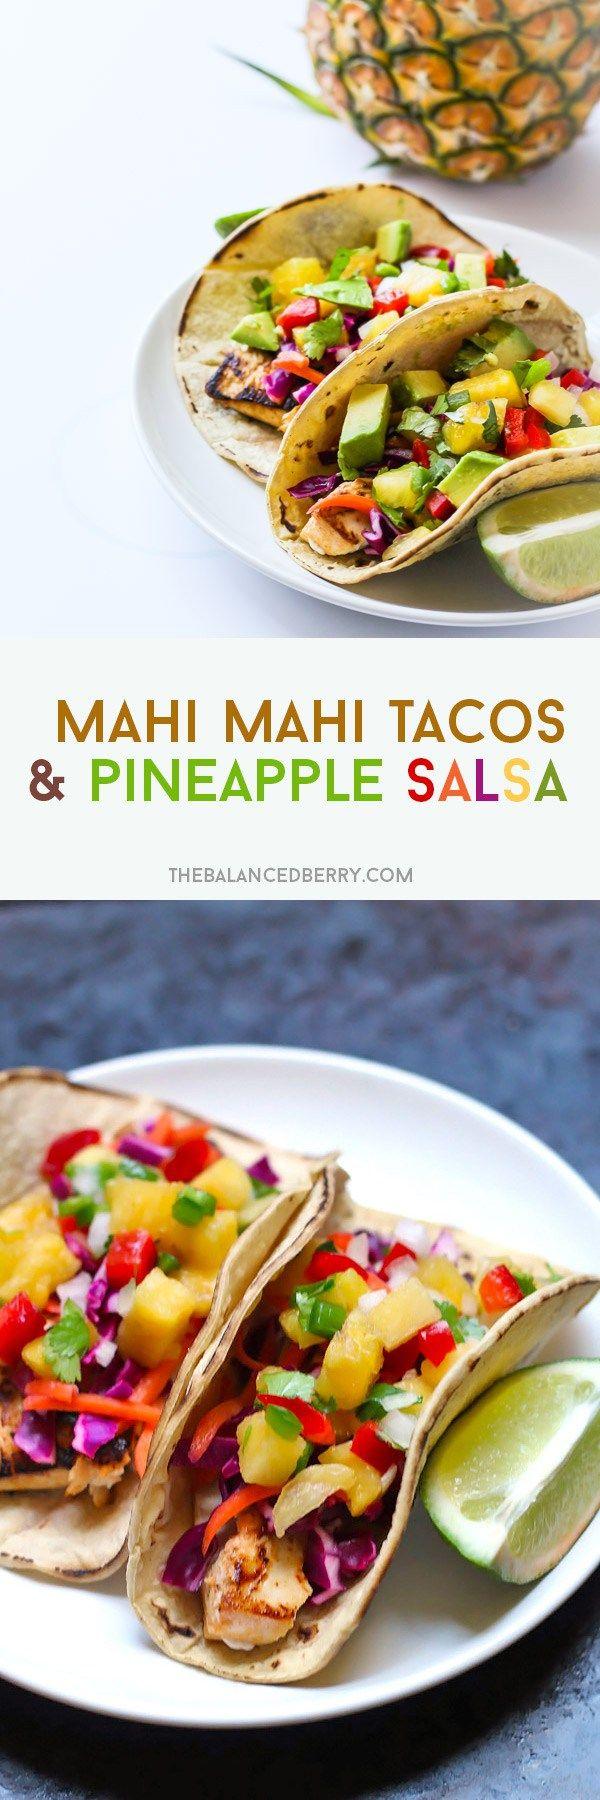 Mahi Mahi Tacos with Pineapple Salsa via thebalancedberry.com